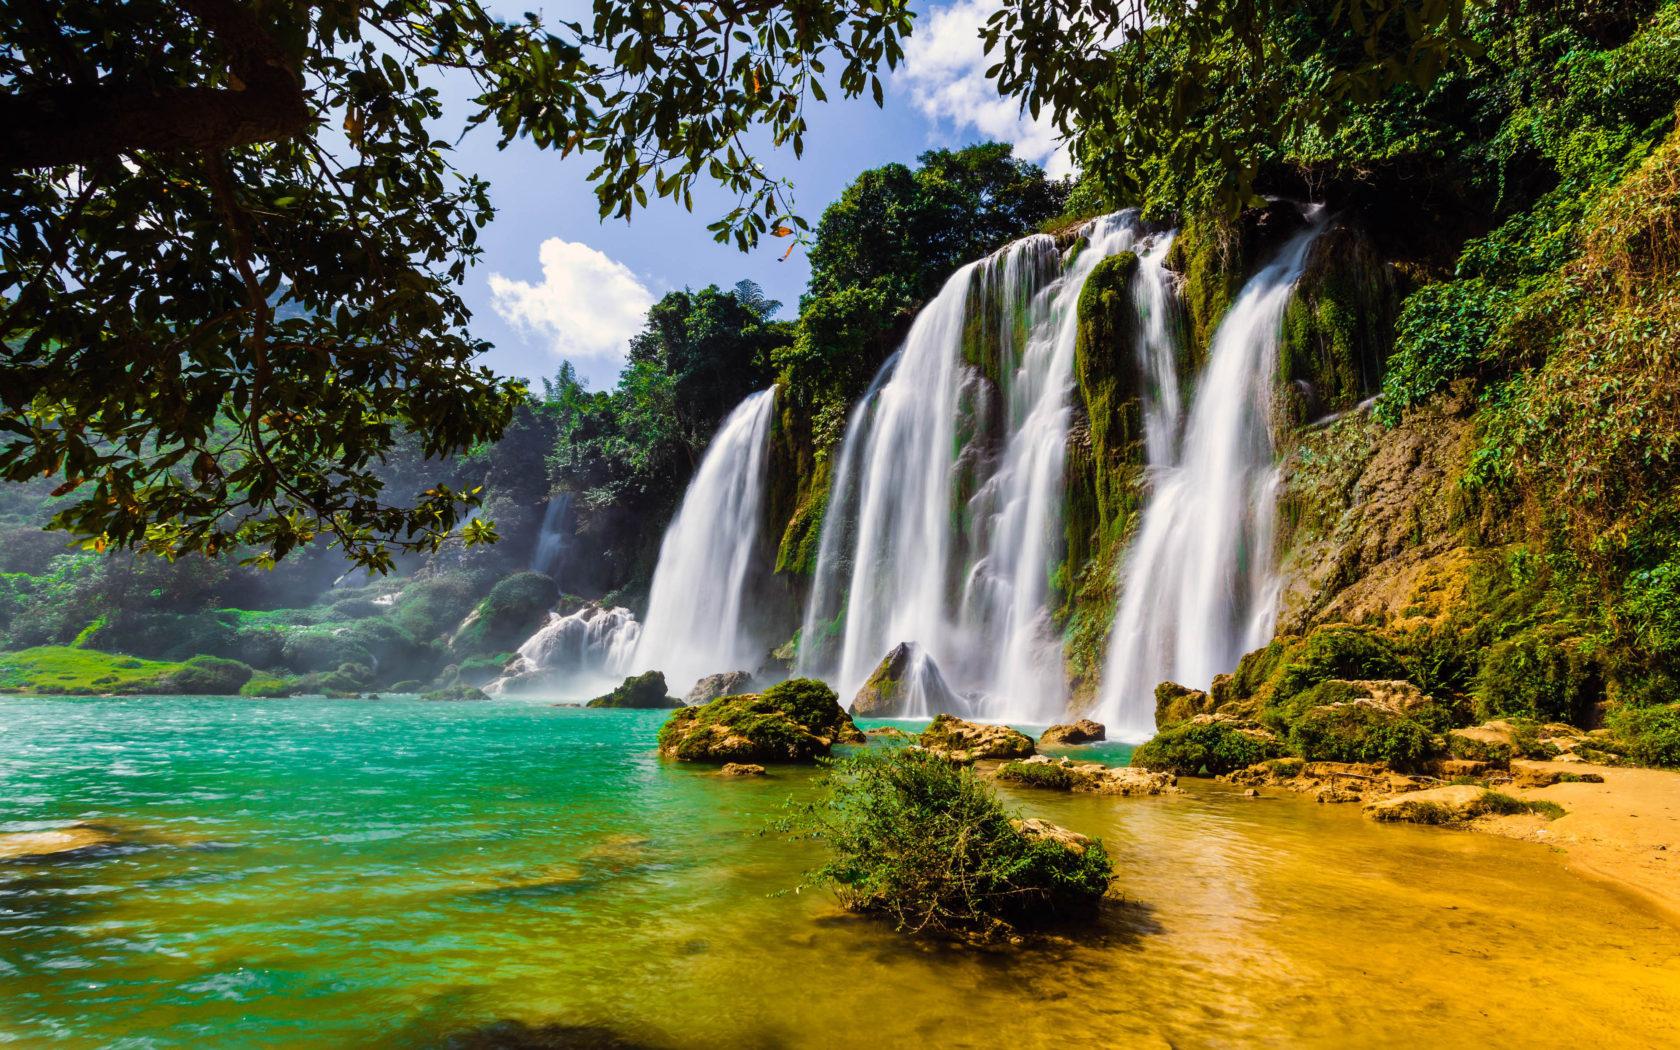 Falls Hd Wallpaper Free Download Ban Gioc Waterfall In China And Vietnam 4k Wallpapers Hd